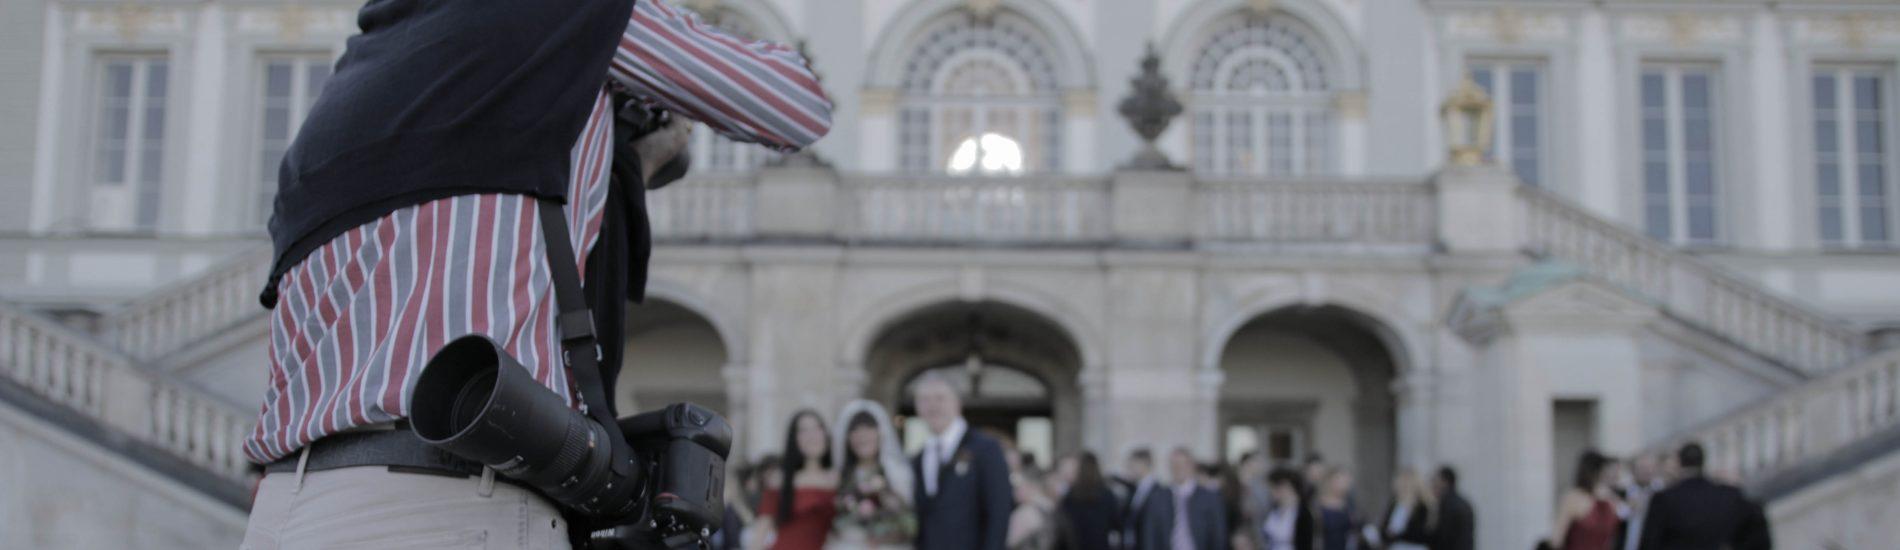 Wedding in Munich Nymphenburg Palace by KebyFilms